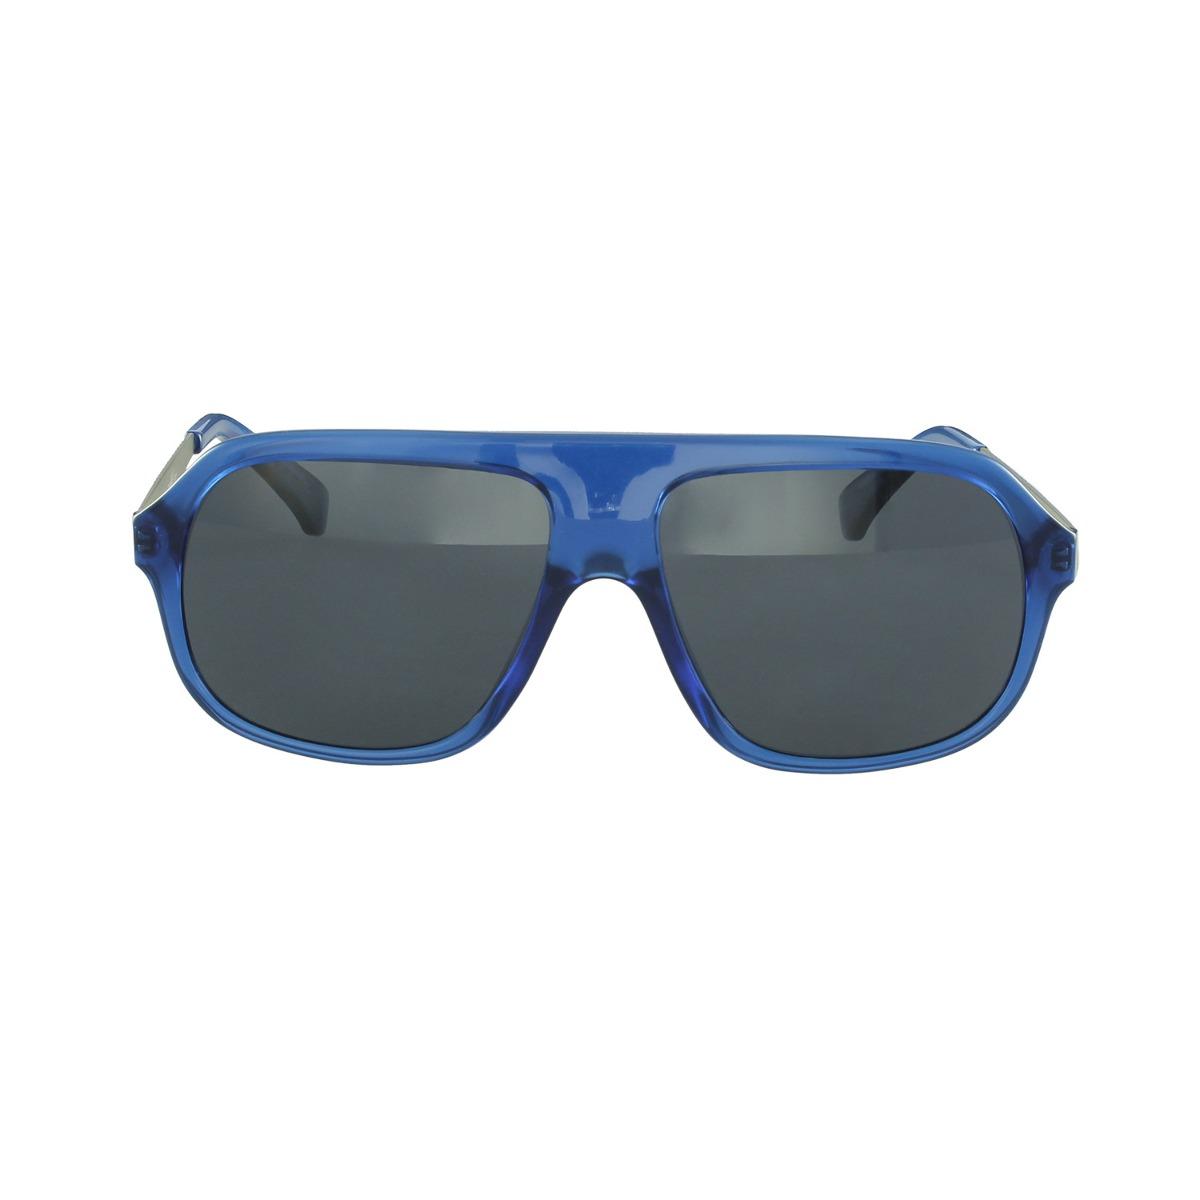 9a96cfa478417 óculos de sol calvin klein esportivo azul. Carregando zoom.